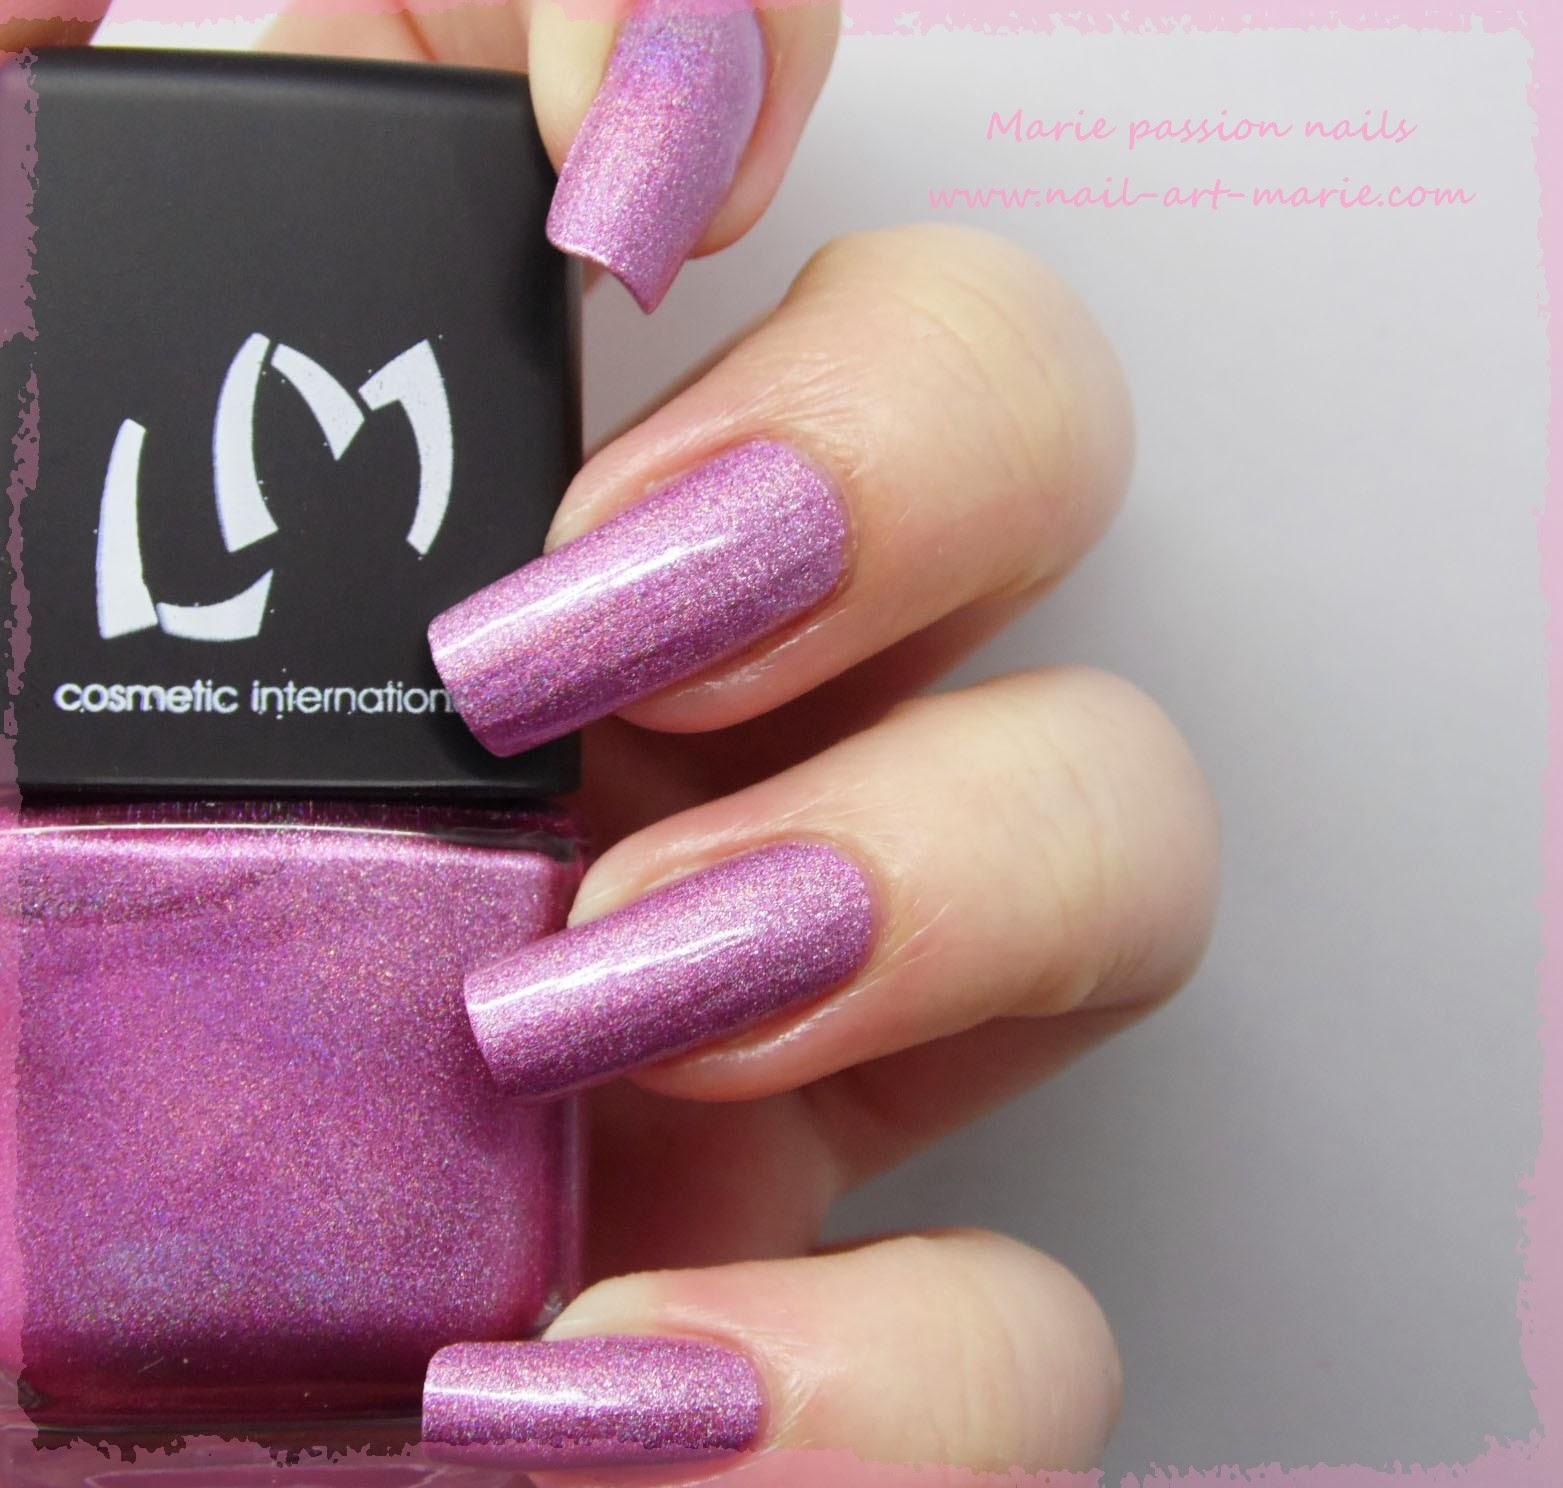 LM Cosmetic Izar3